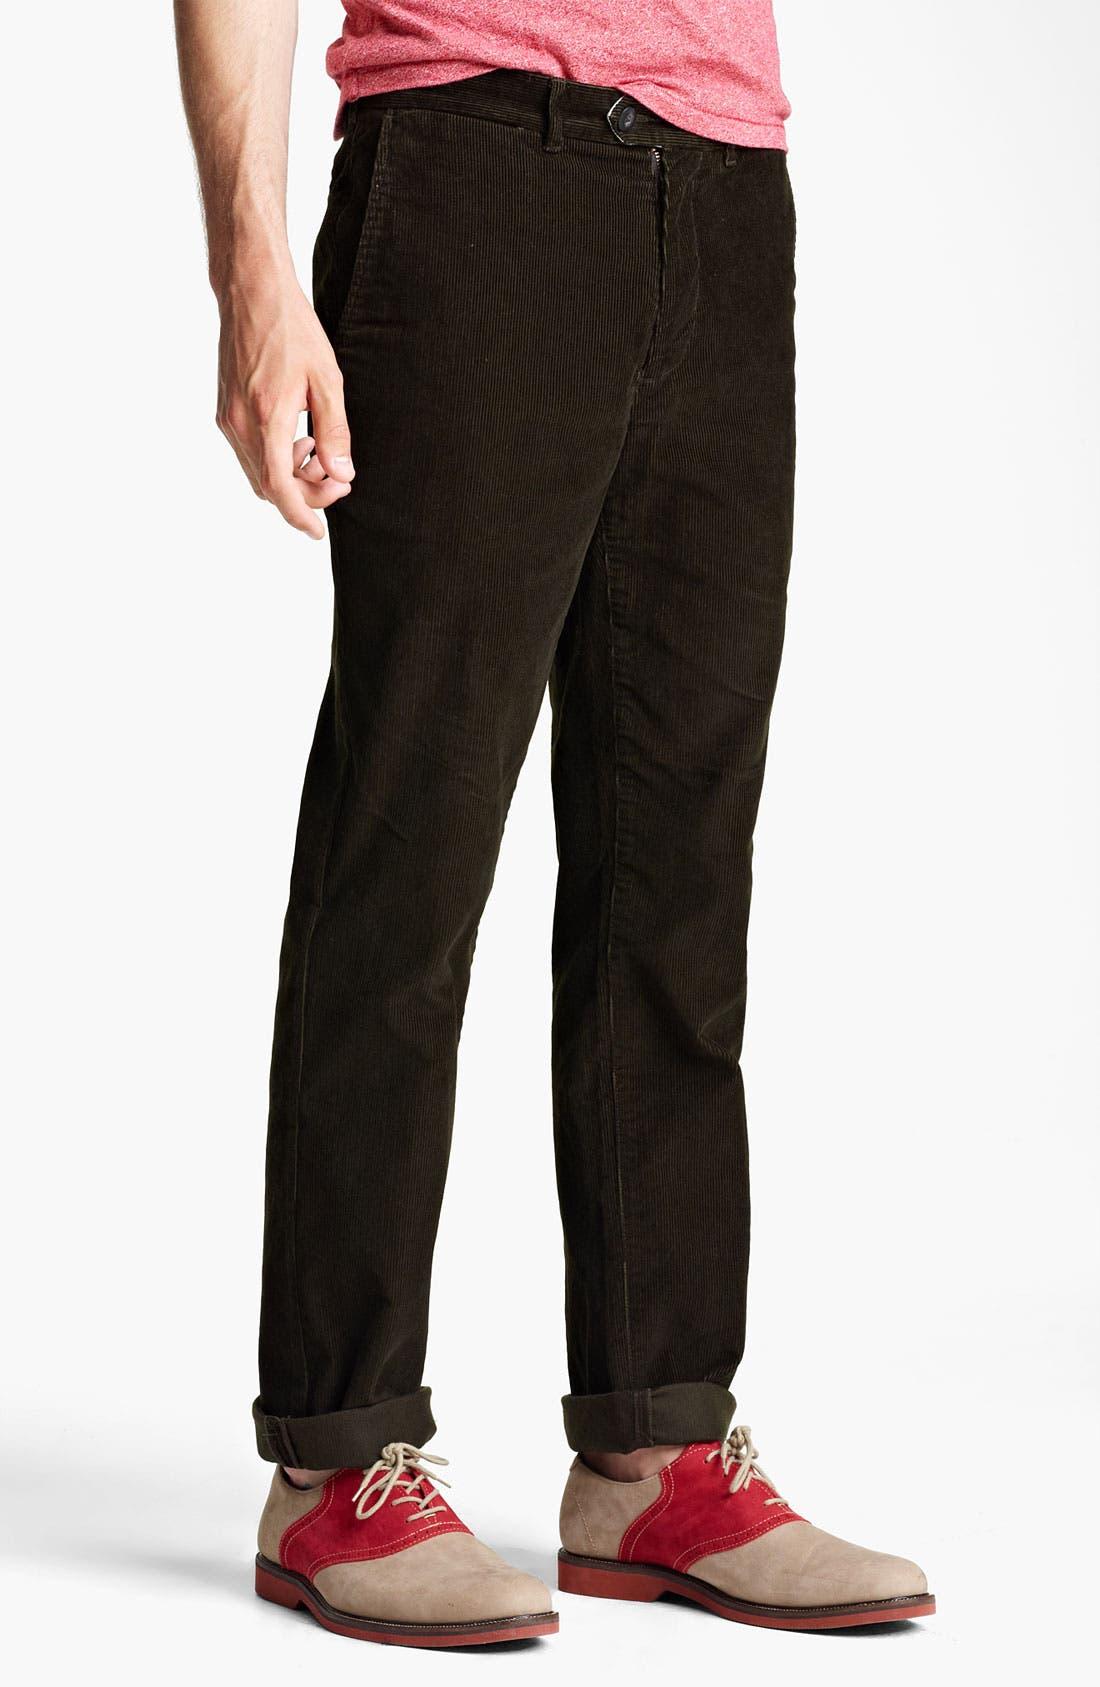 Alternate Image 1 Selected - Jack Spade 'Dolan' Straight Leg Corduroy Pants